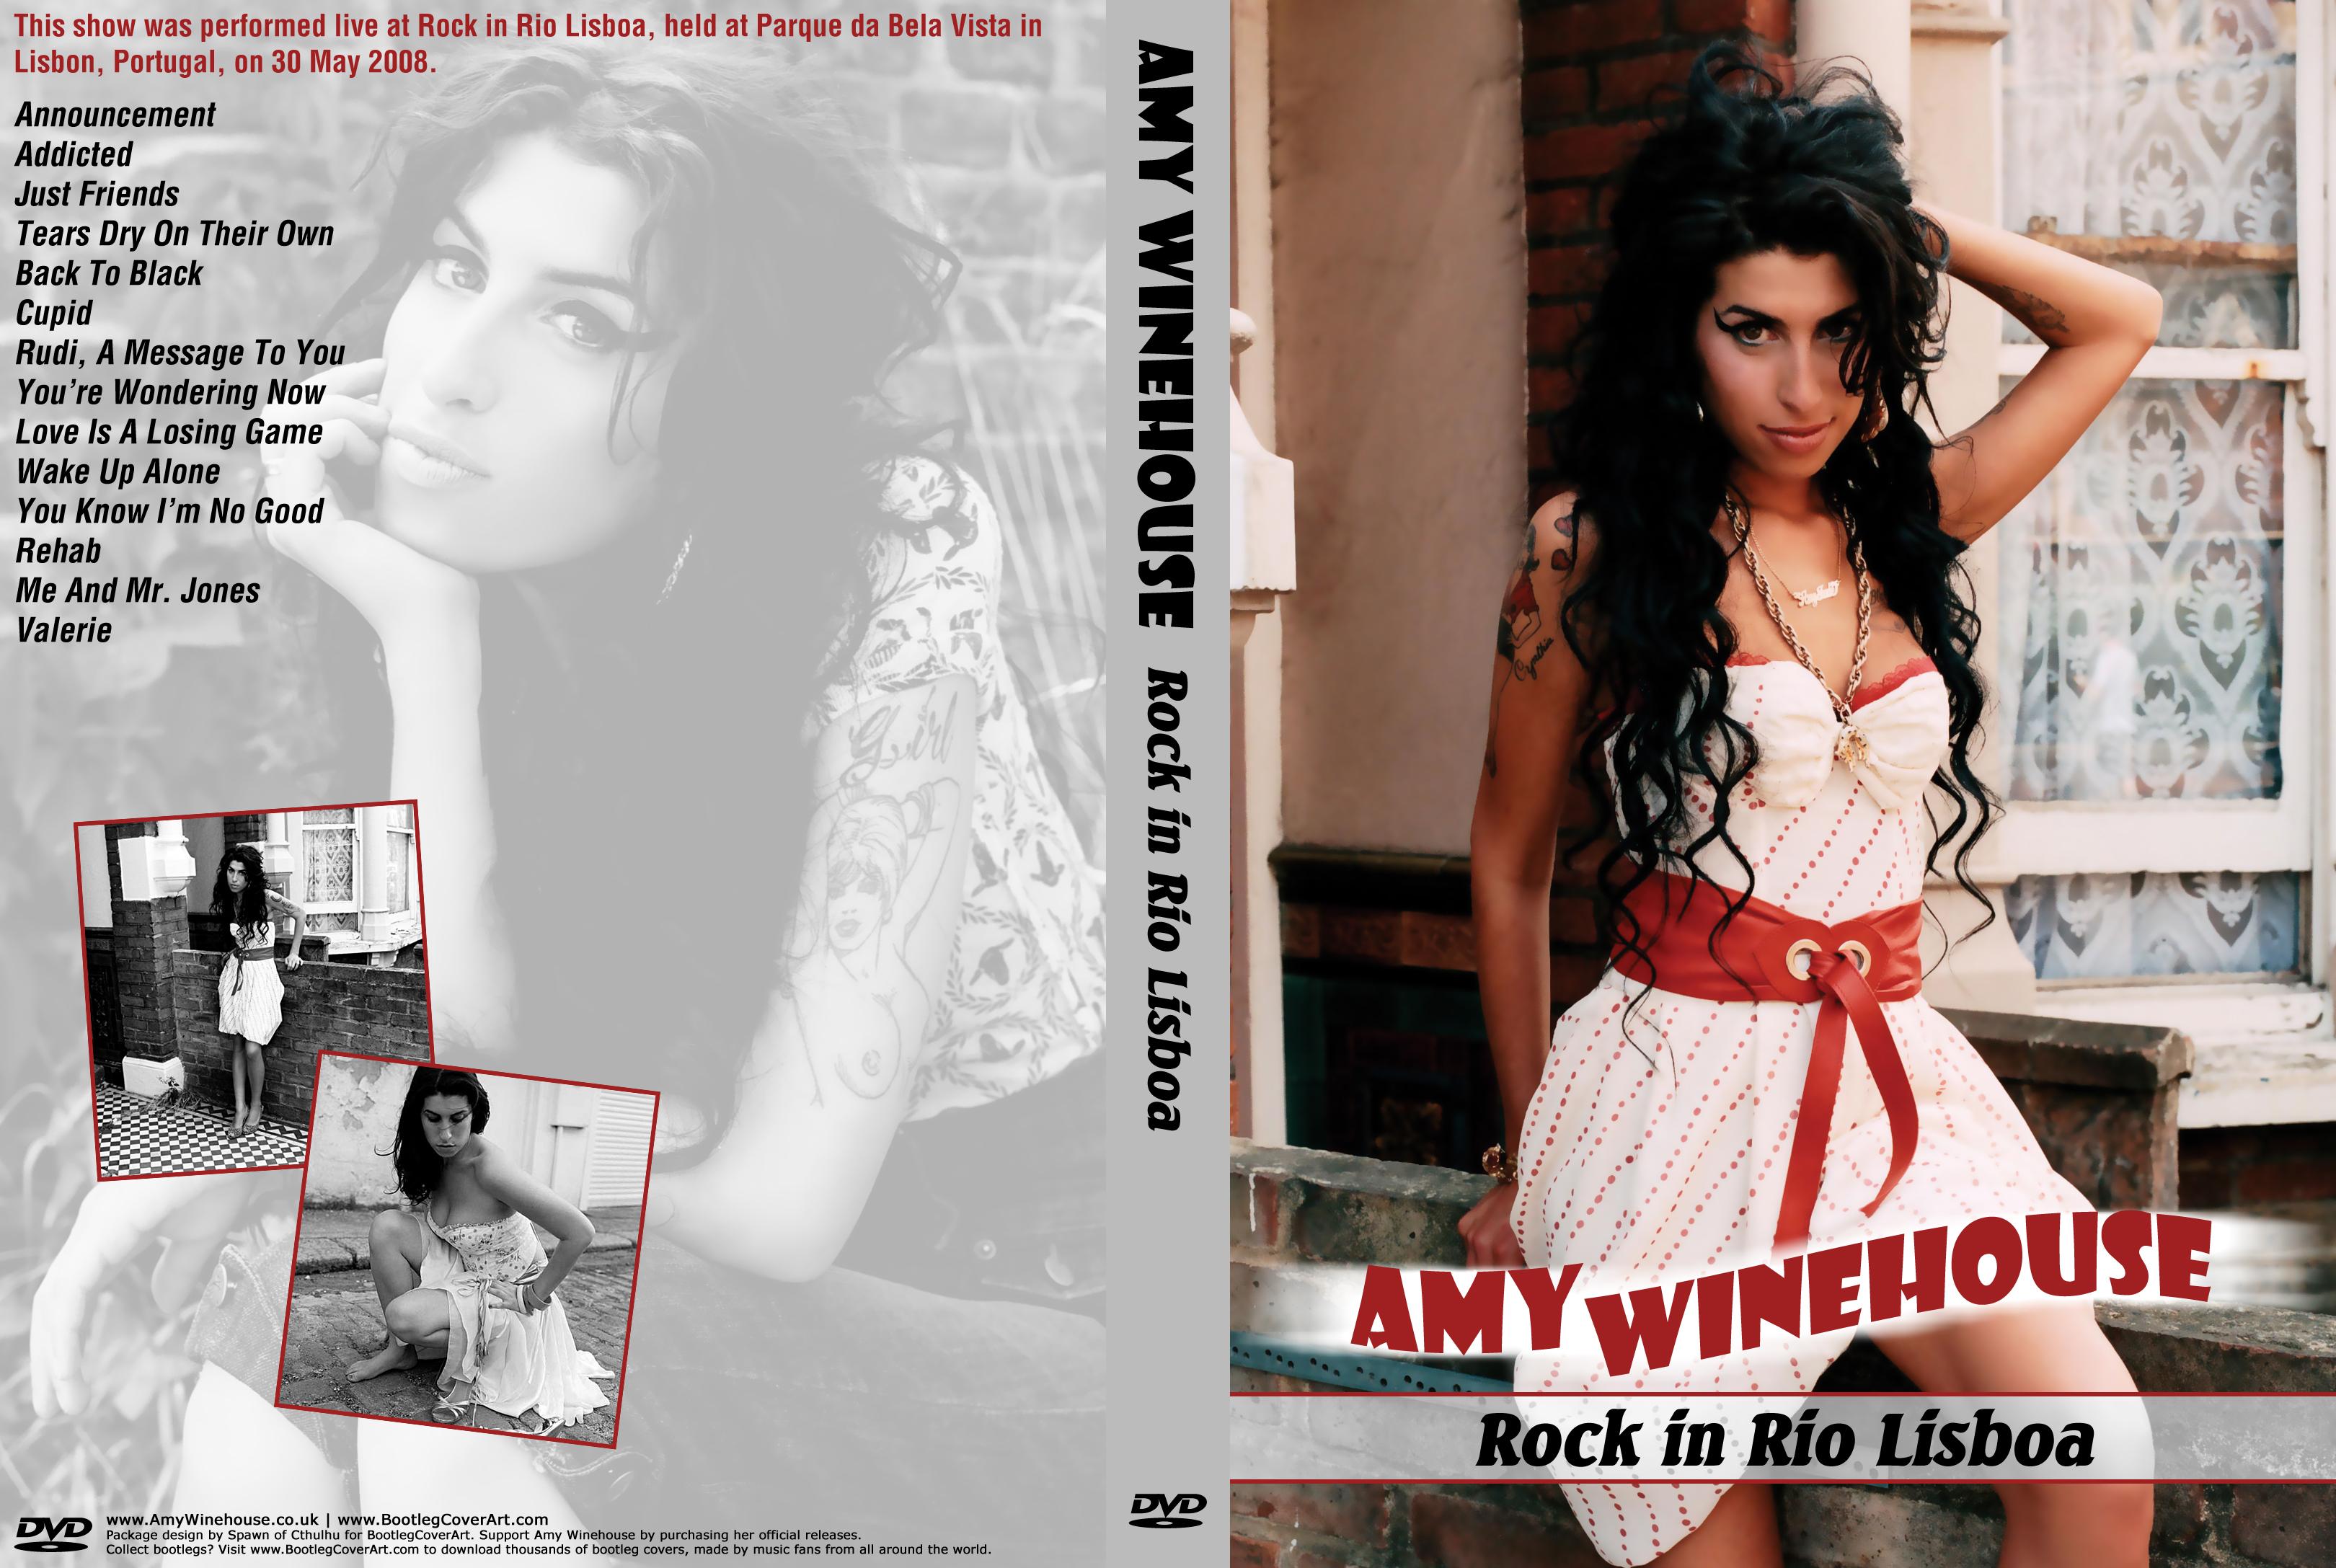 Amy Winehouse - Live Rock In Rio 2008 DVD